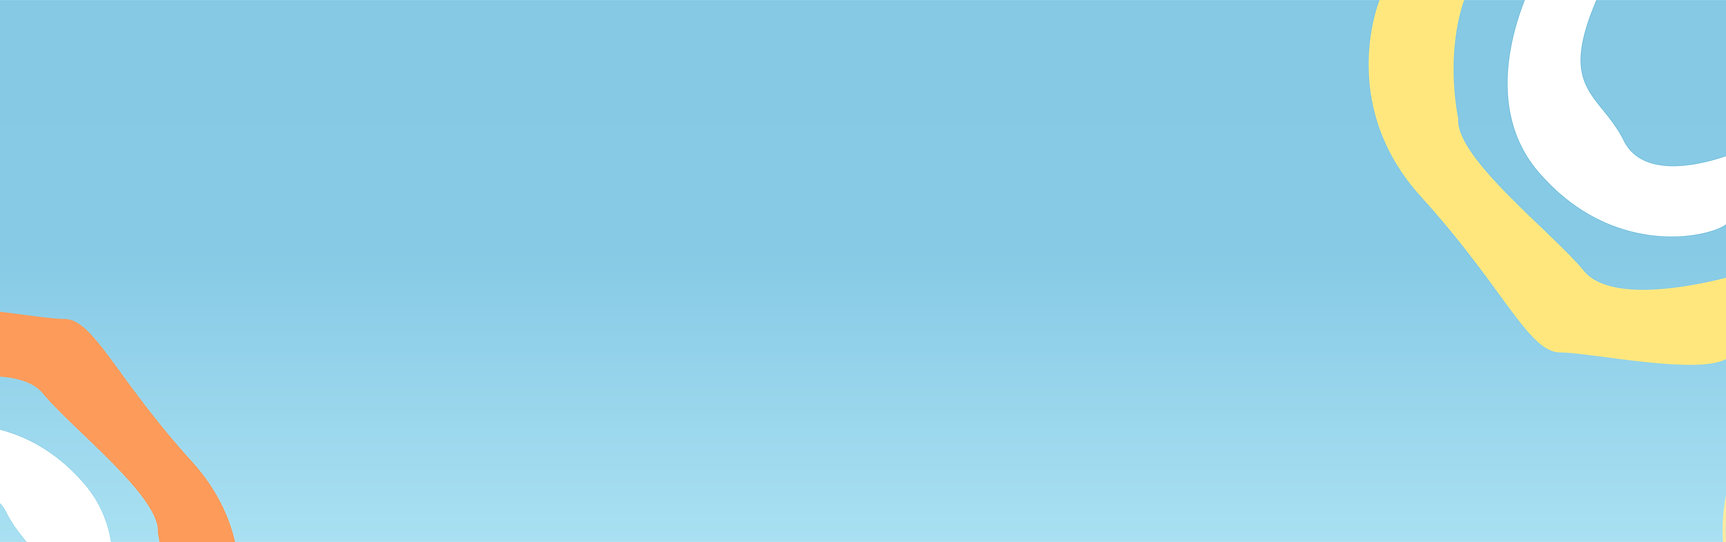 banner web fondo-01.jpg